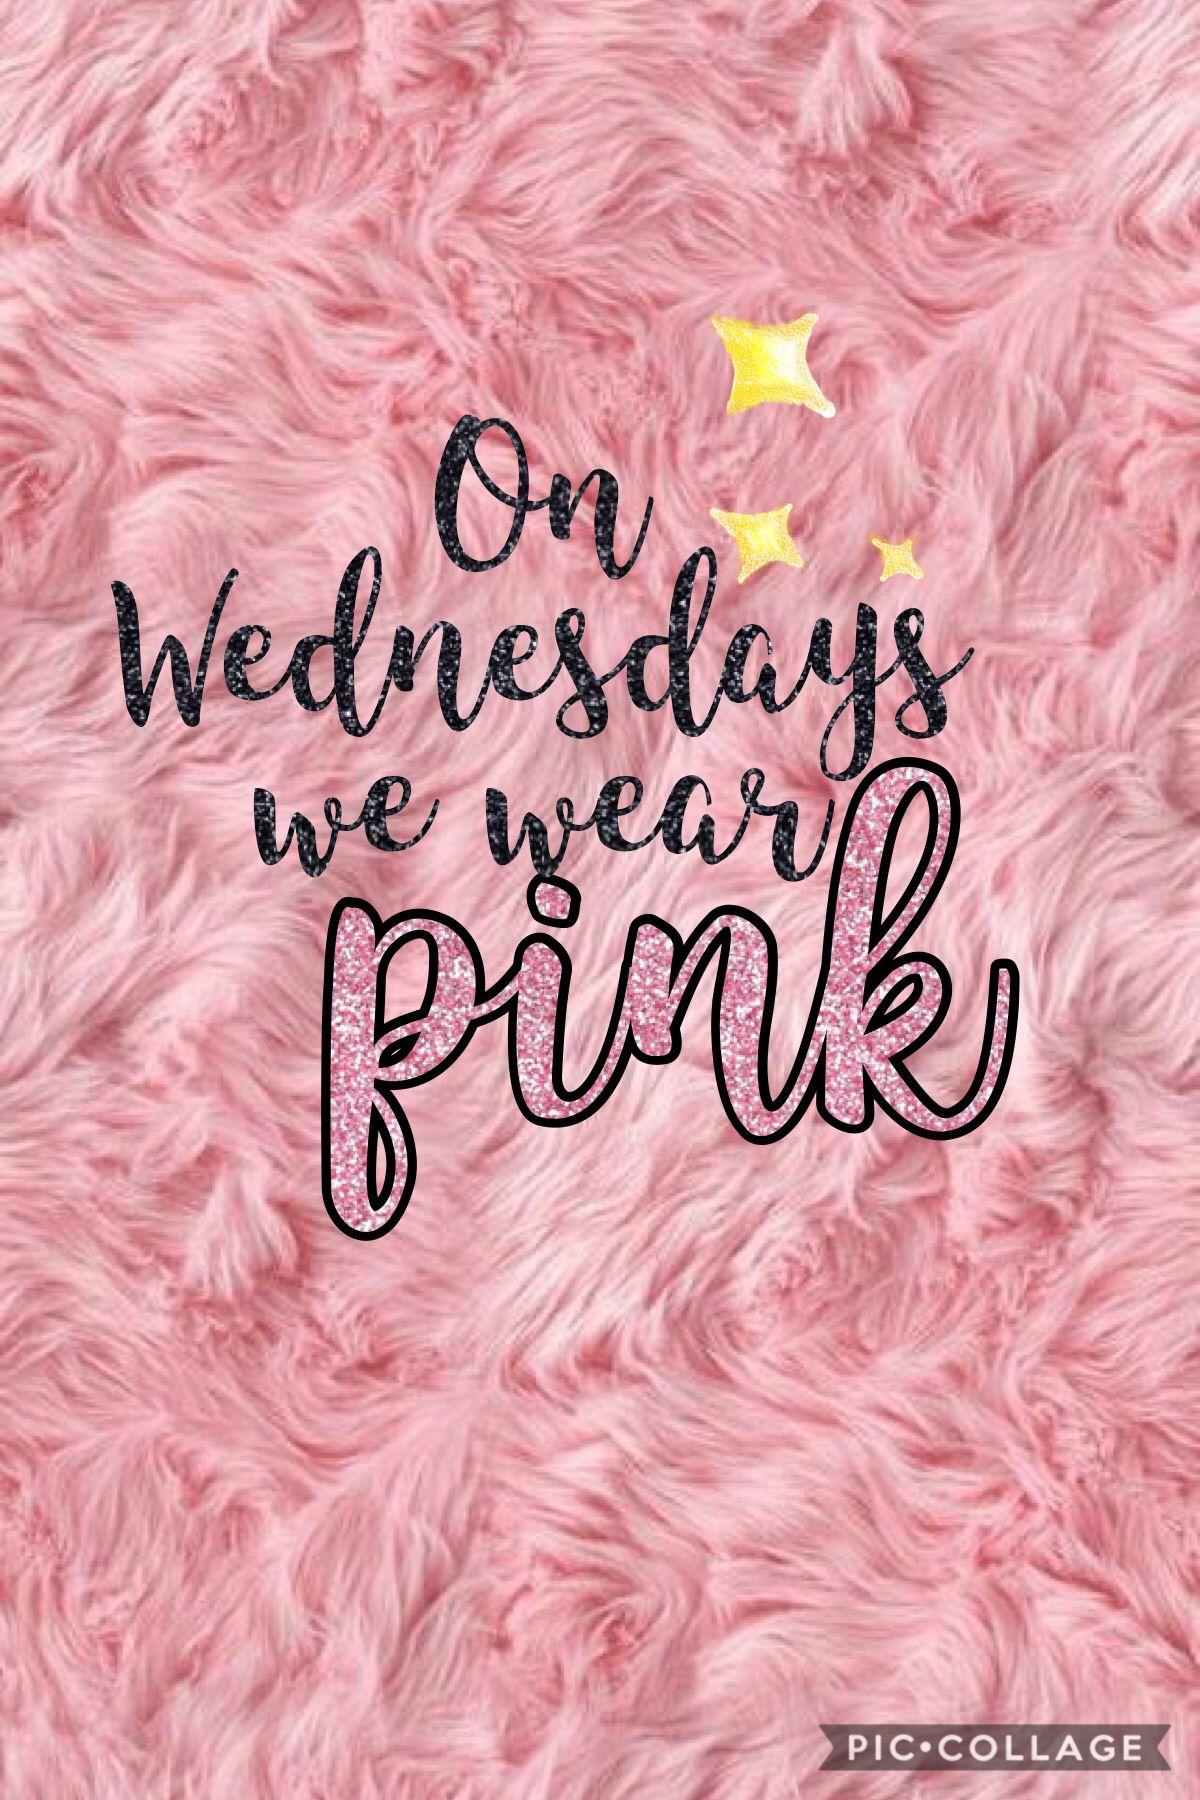 On Wednesdays We Wear Pink Mean Girls Wallpaper